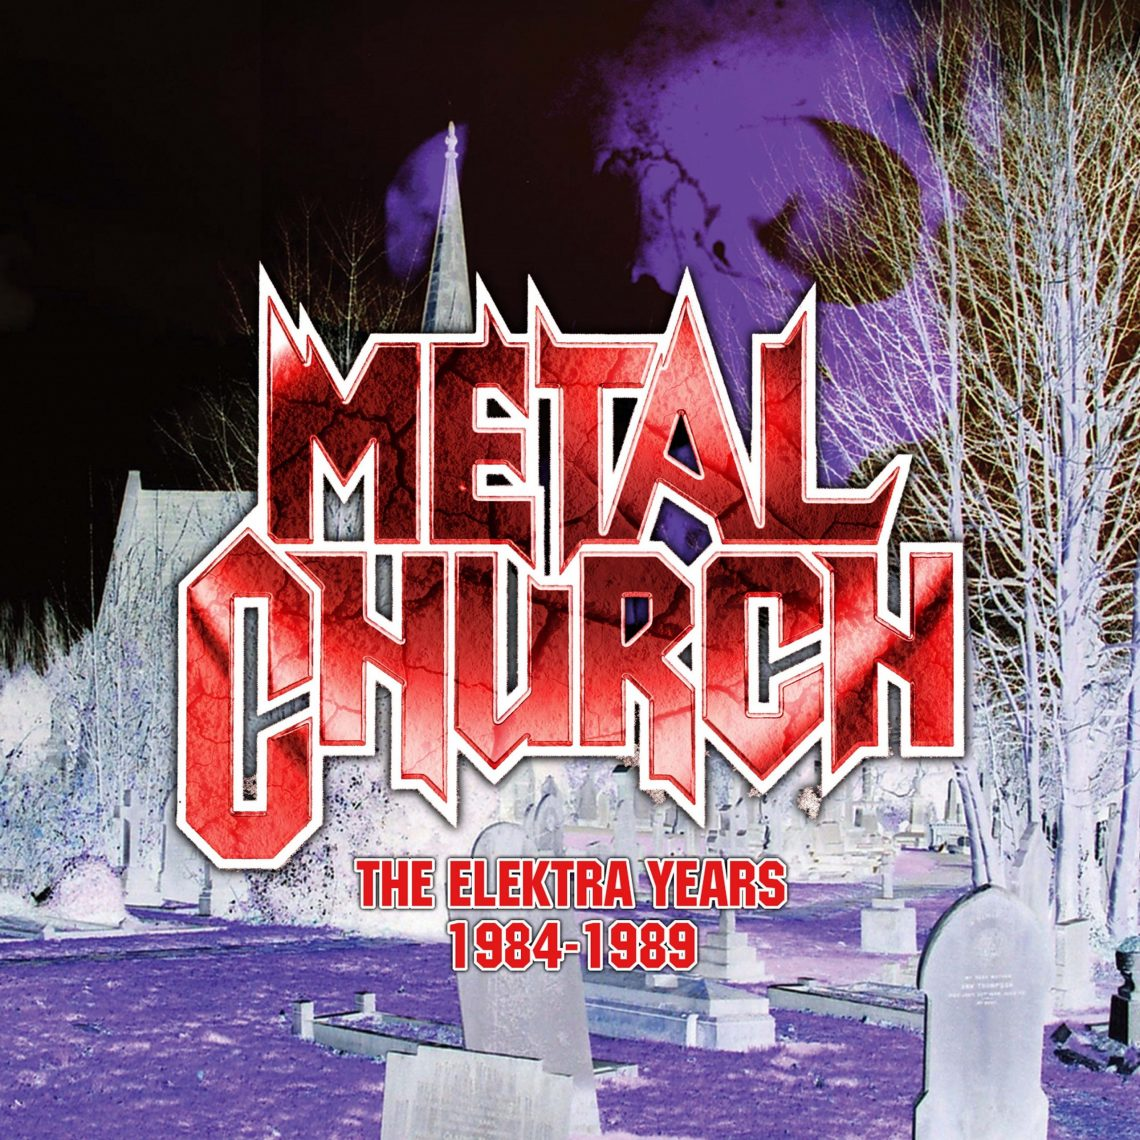 Metal Church: The Elektra Years 1984-1989, 3CD Remastered Gatefold Digisleeve